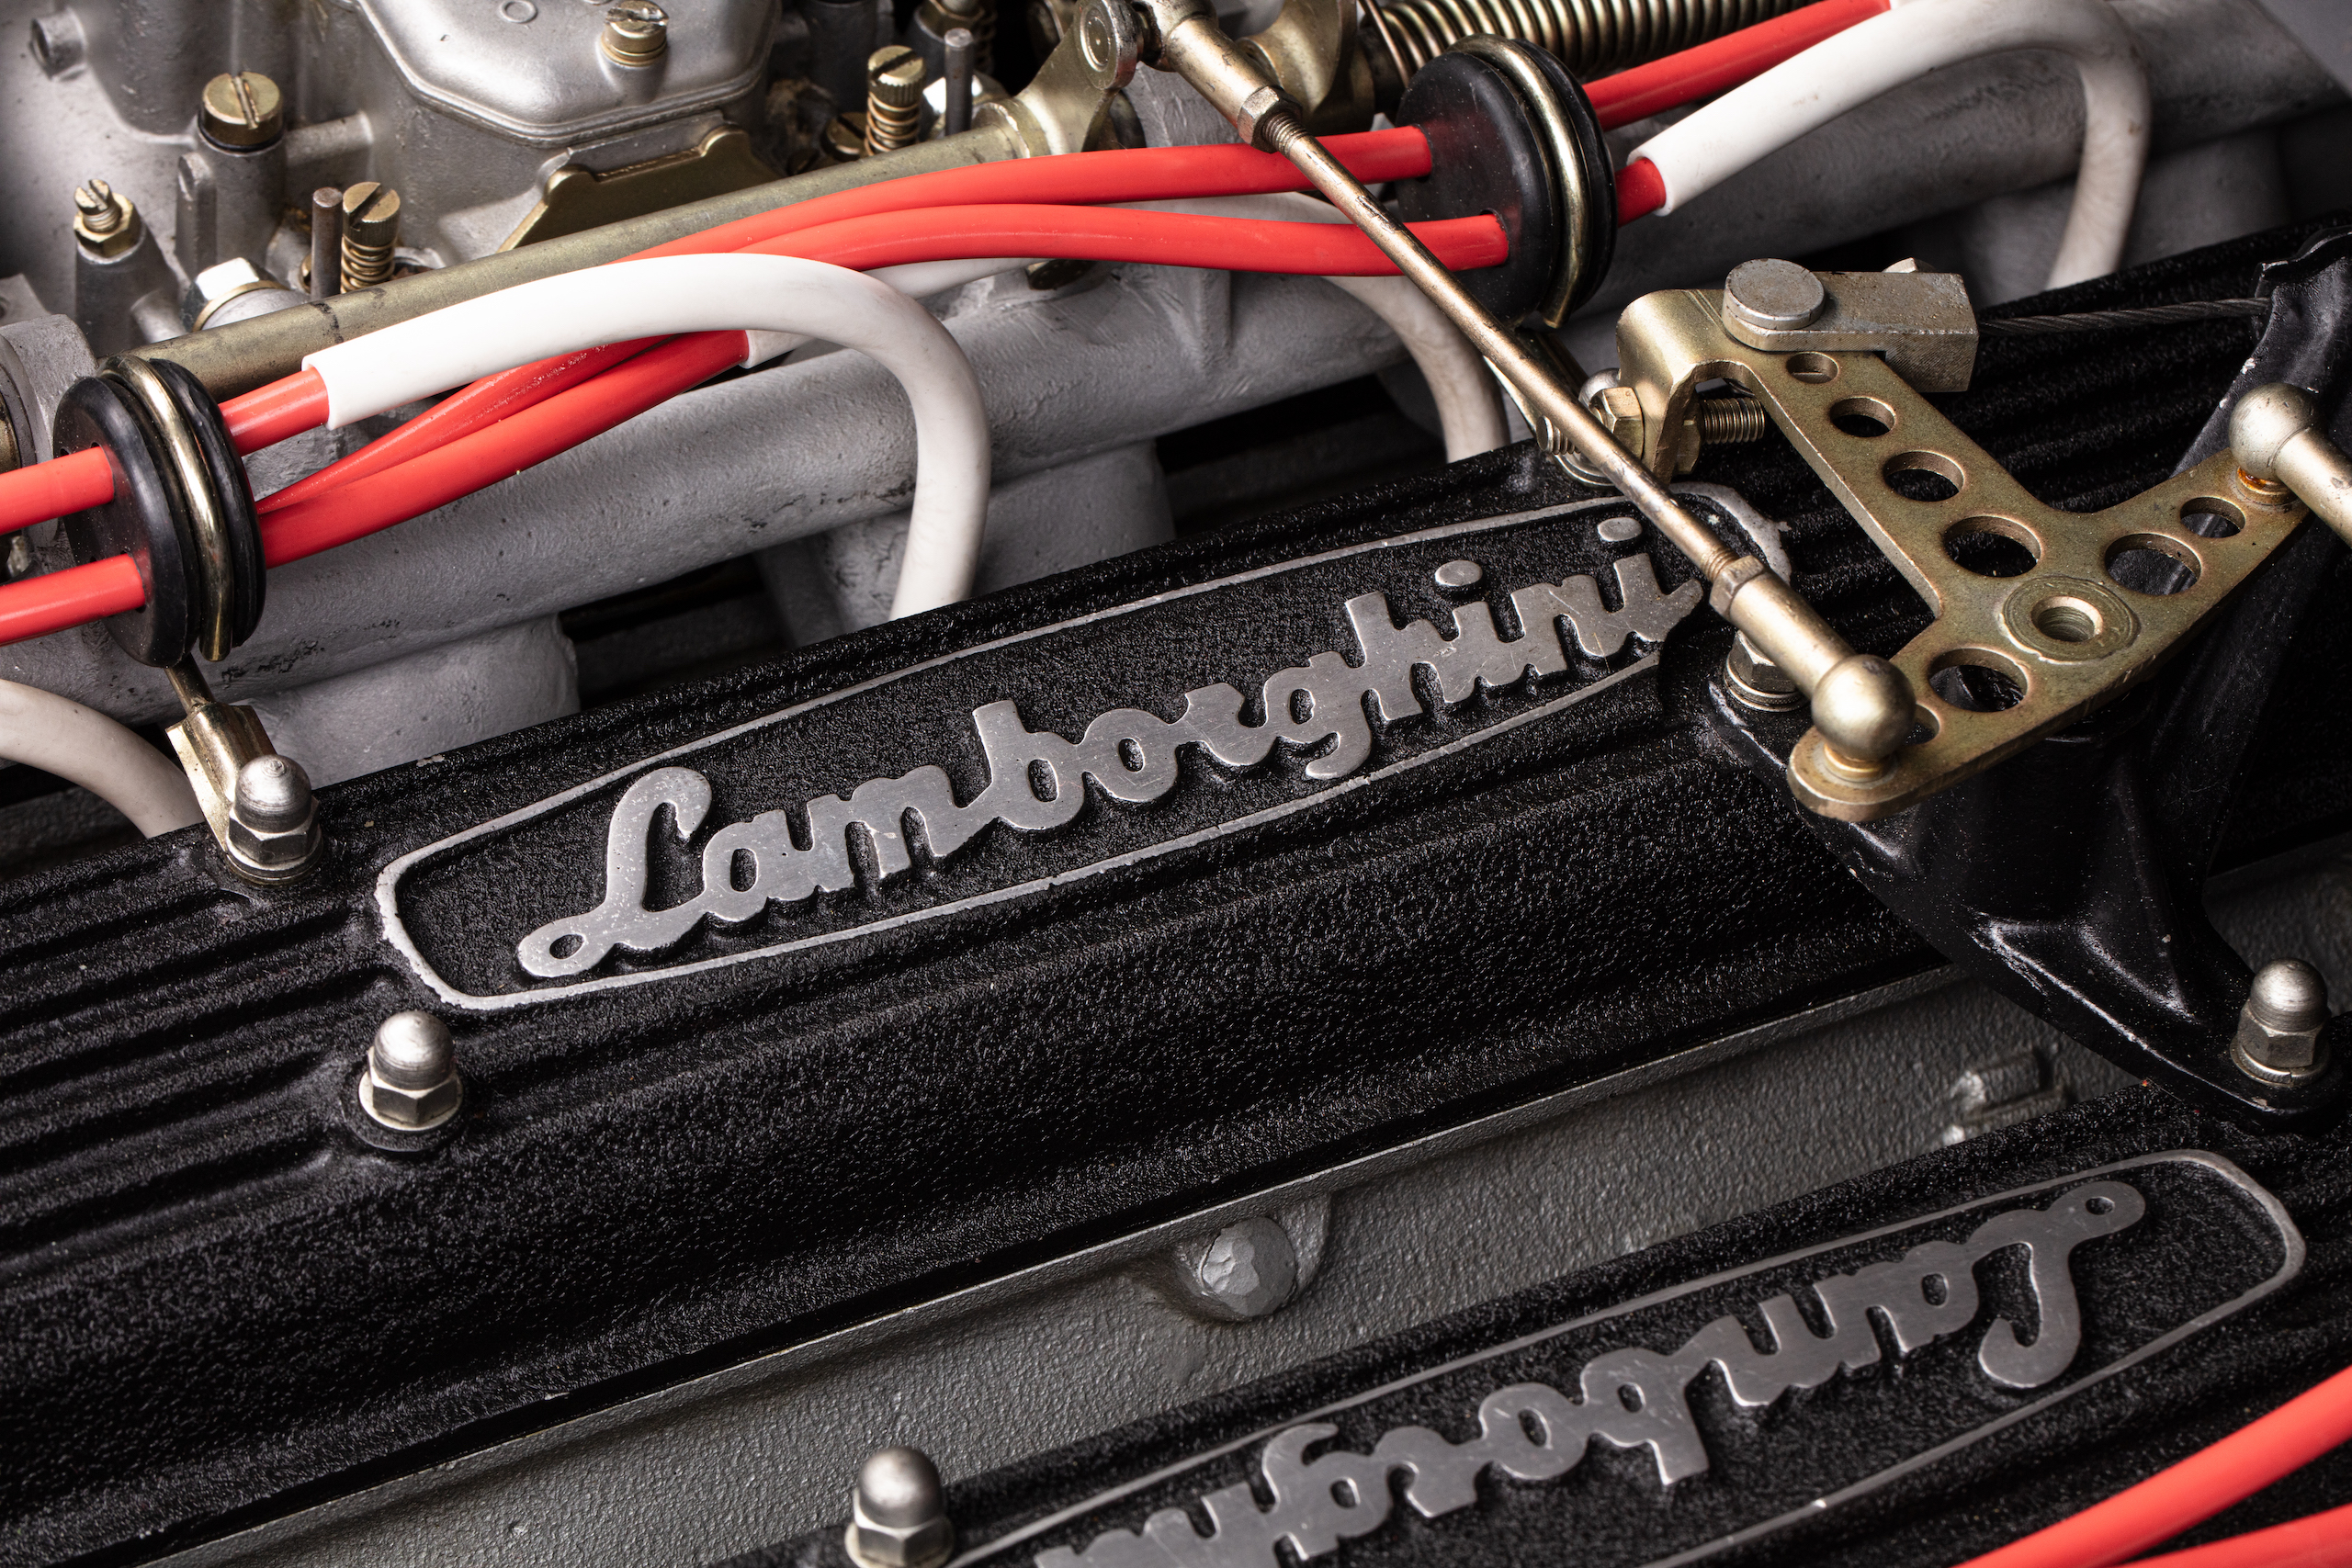 Countach Engine detail